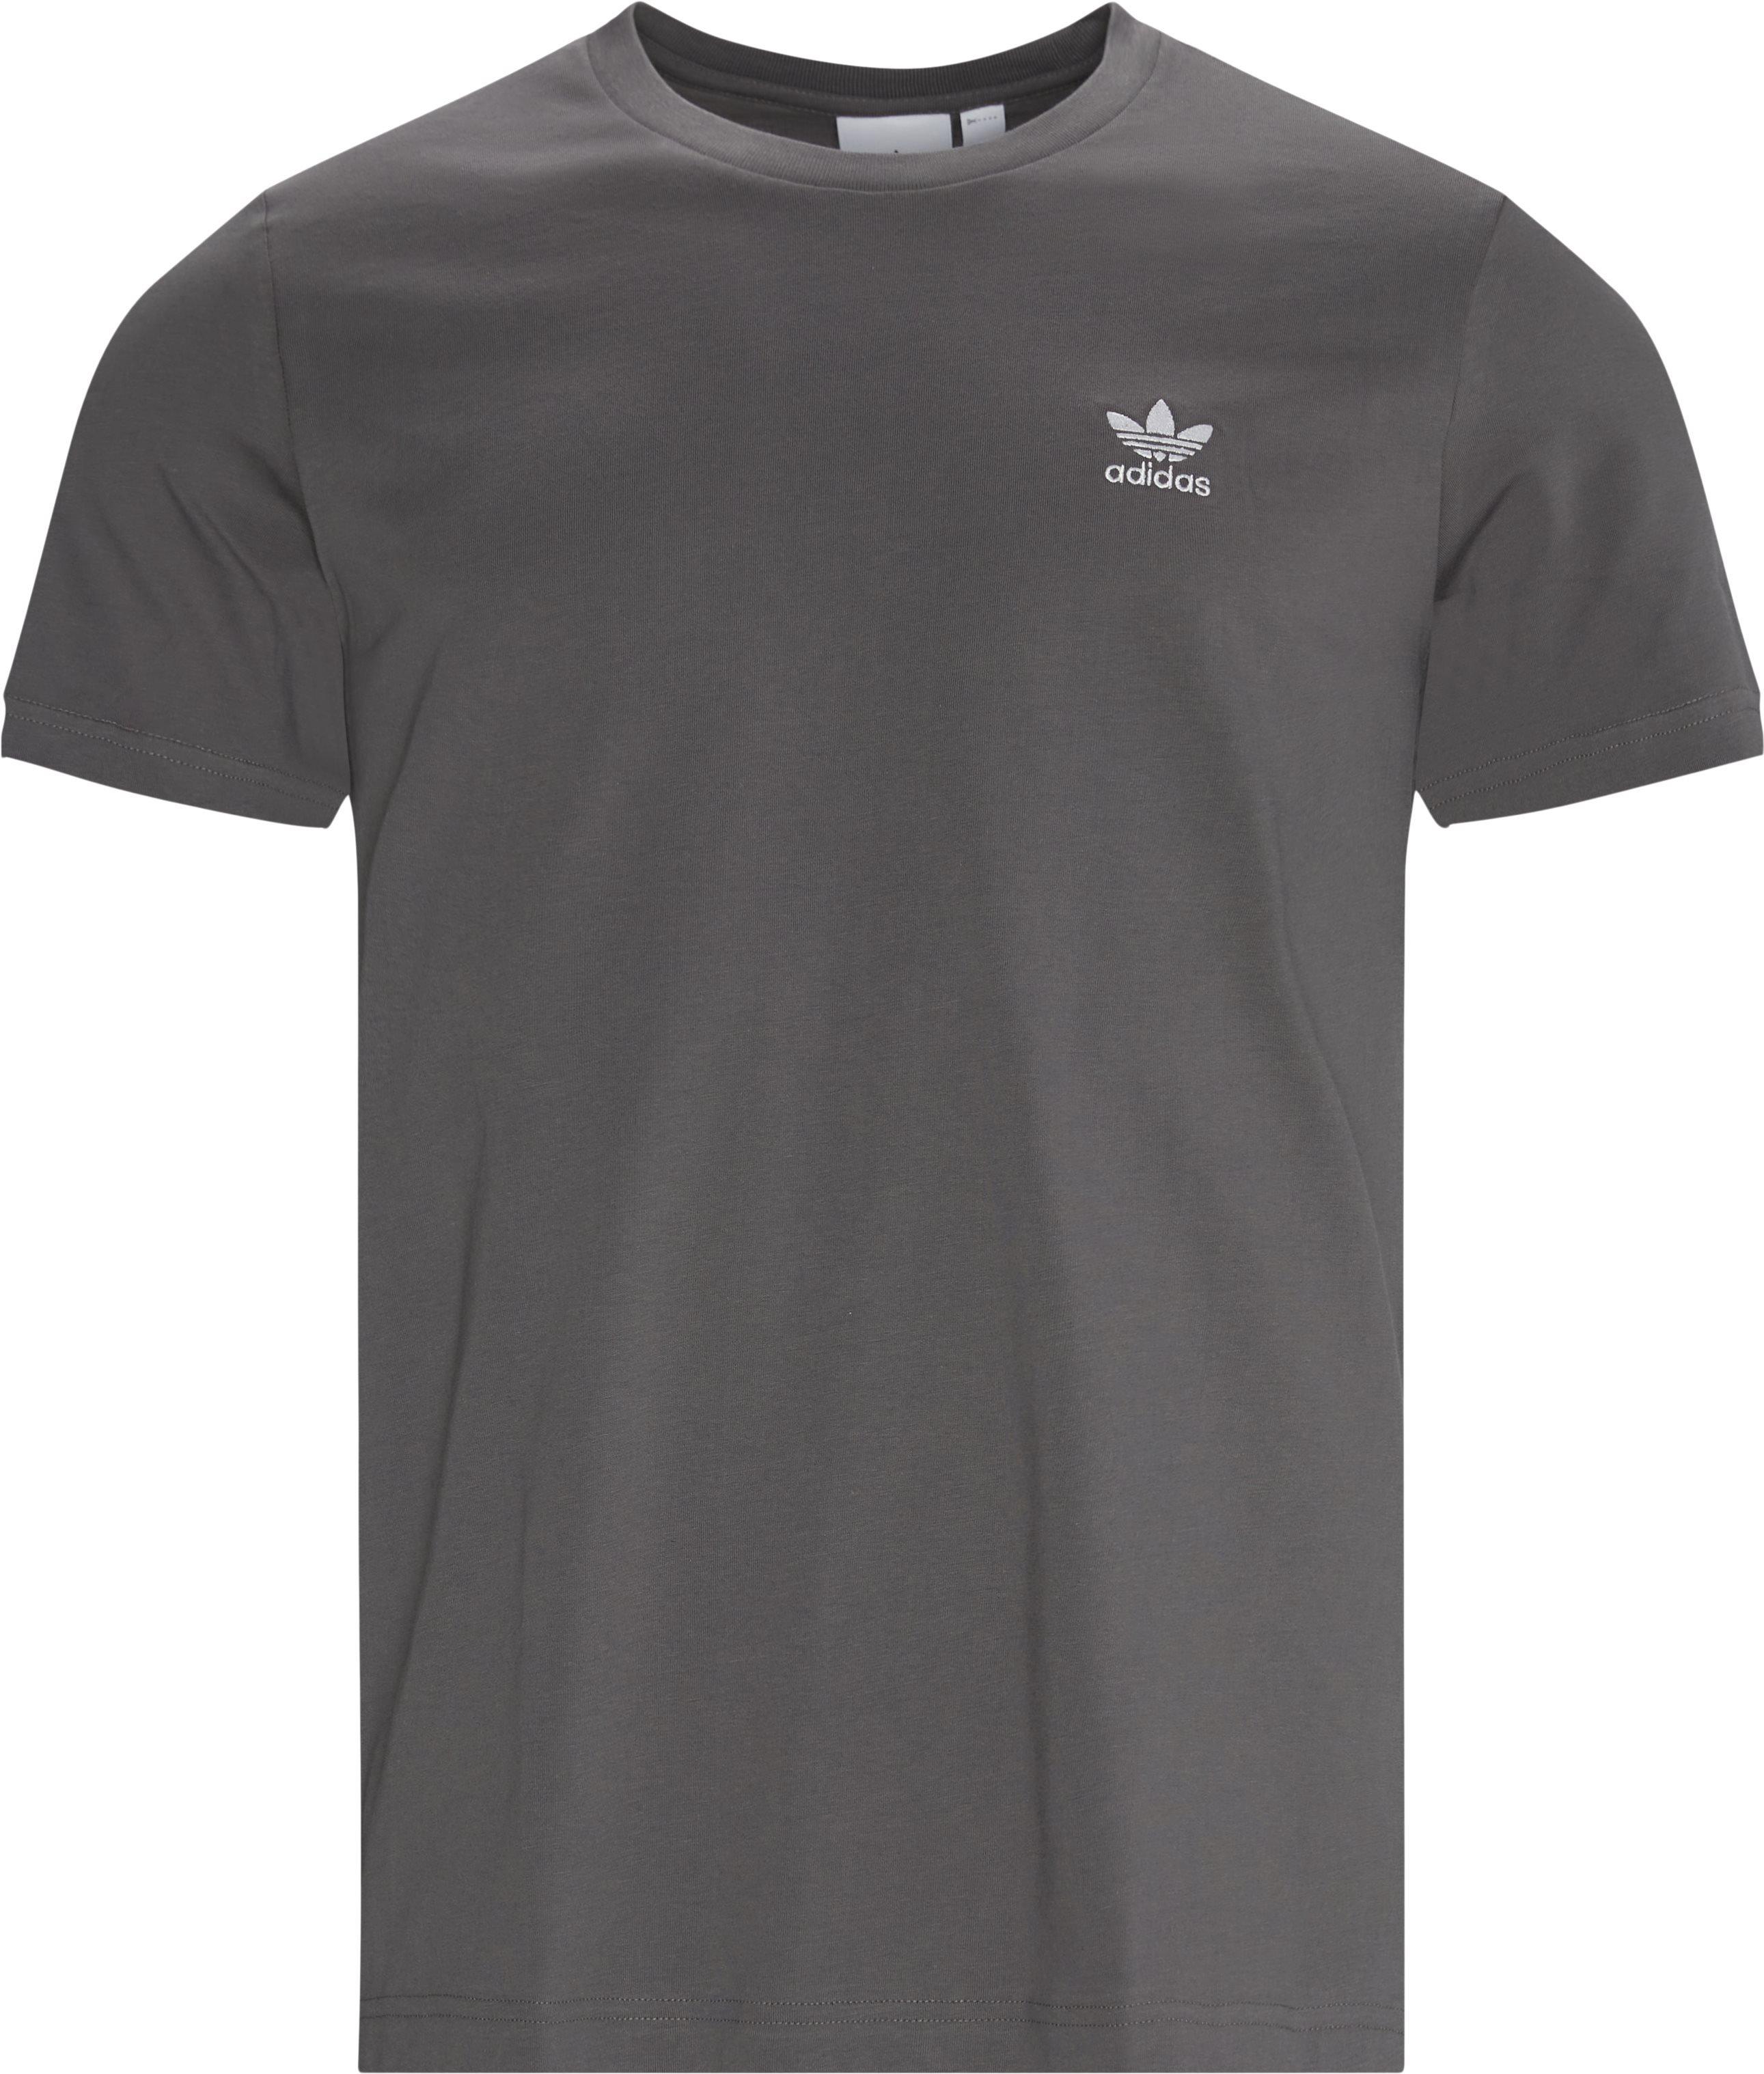 Essential Tee - T-shirts - Regular - Grey